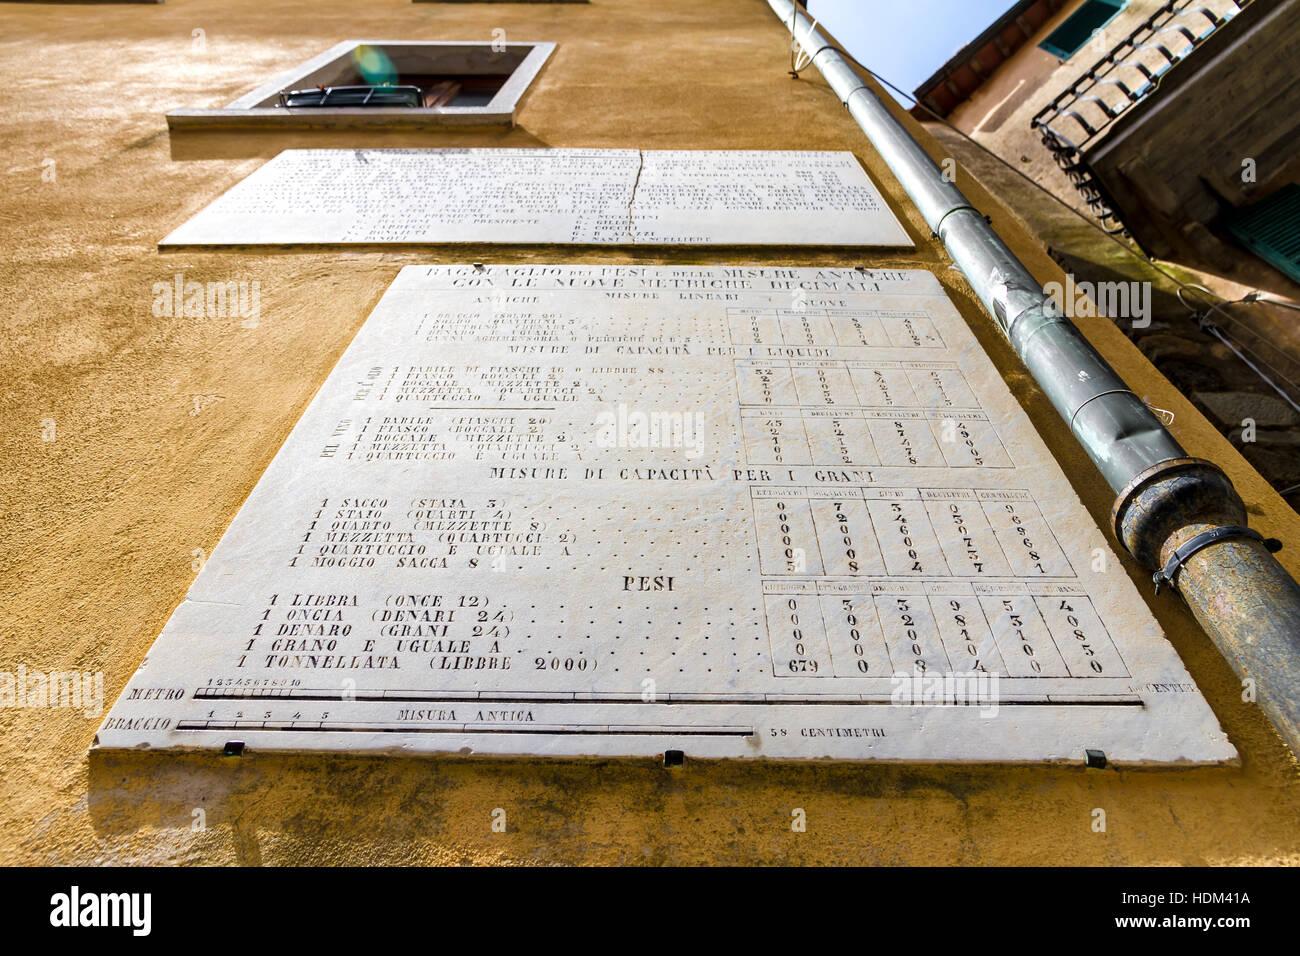 Campiglia Marittima, Italy - June 23, 2014: Ancient (19th Century) conversion metricu system plaque - Stock Image